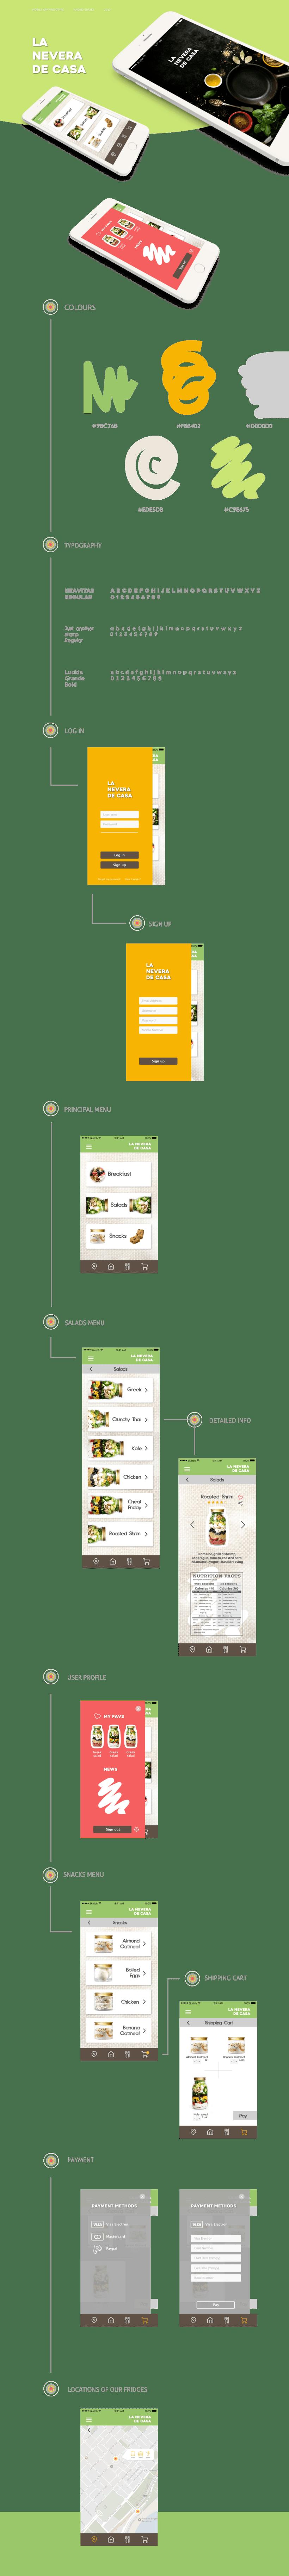 Mobile App | La Nevera de Casa 0